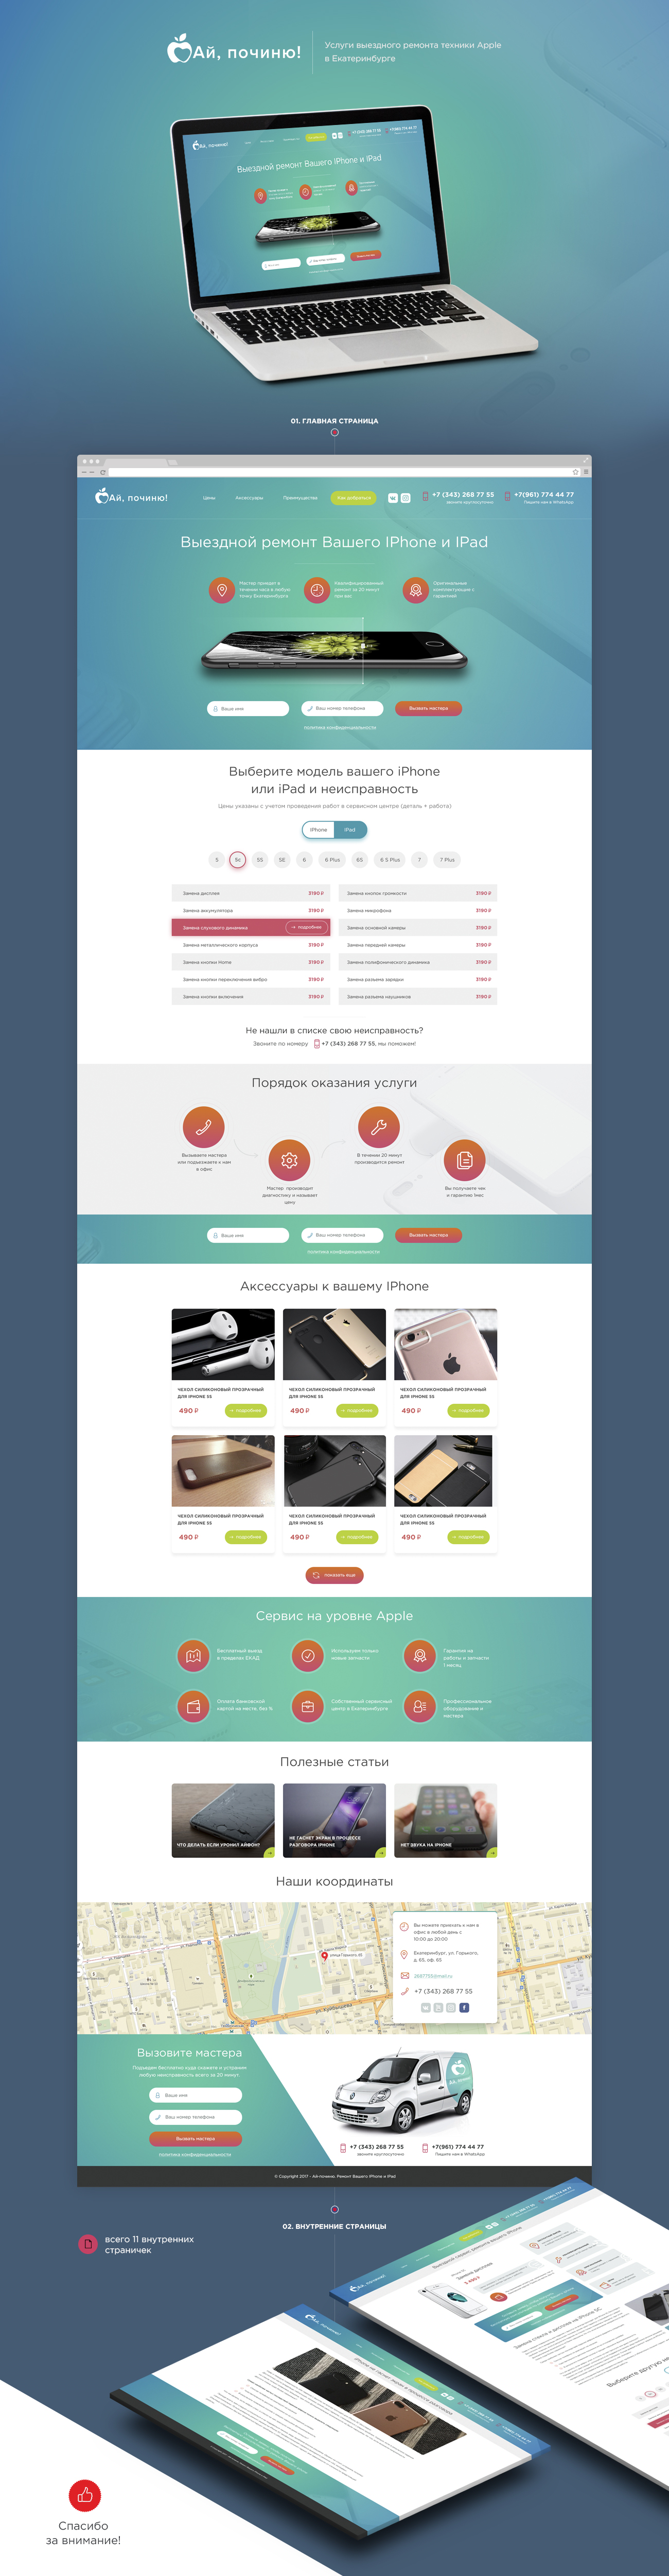 Дизайн сайта для компании АйПочиню - ремонт техники Apple